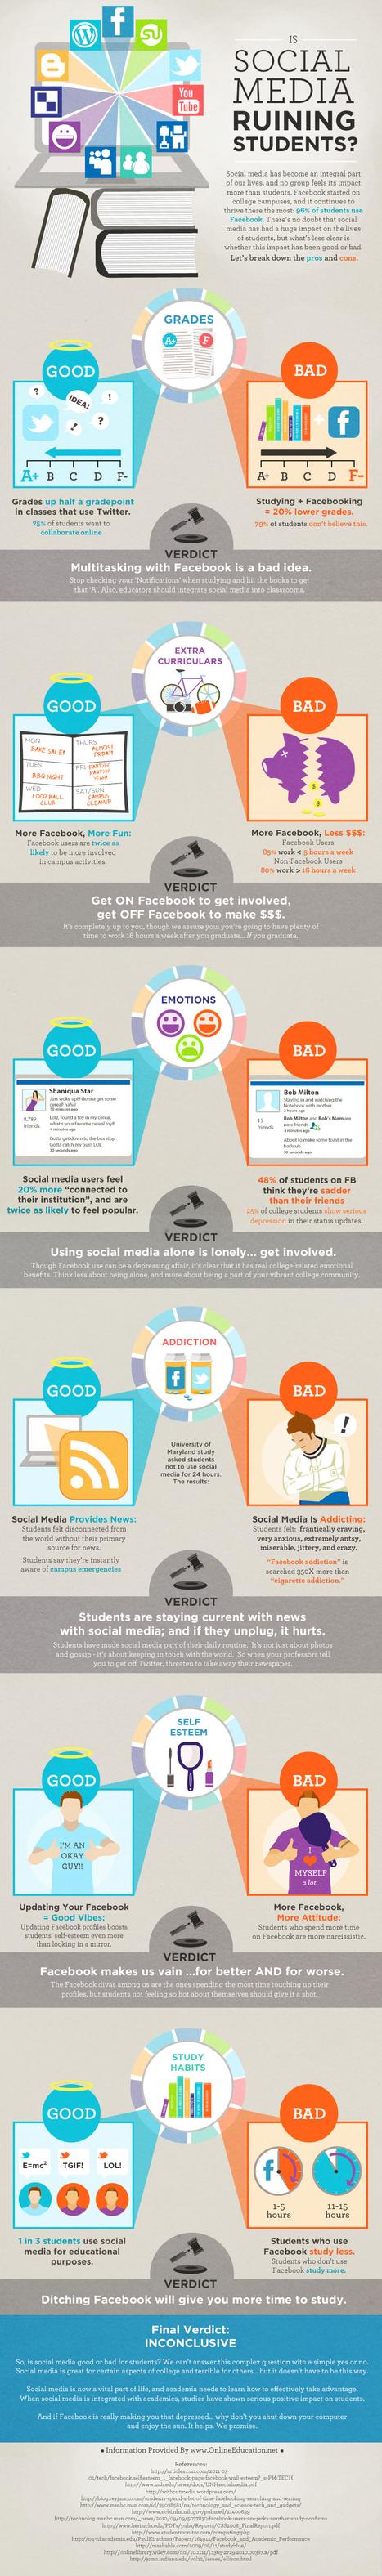 Is Social Media Ruining Students? | TEFL & Ed Tech | Scoop.it